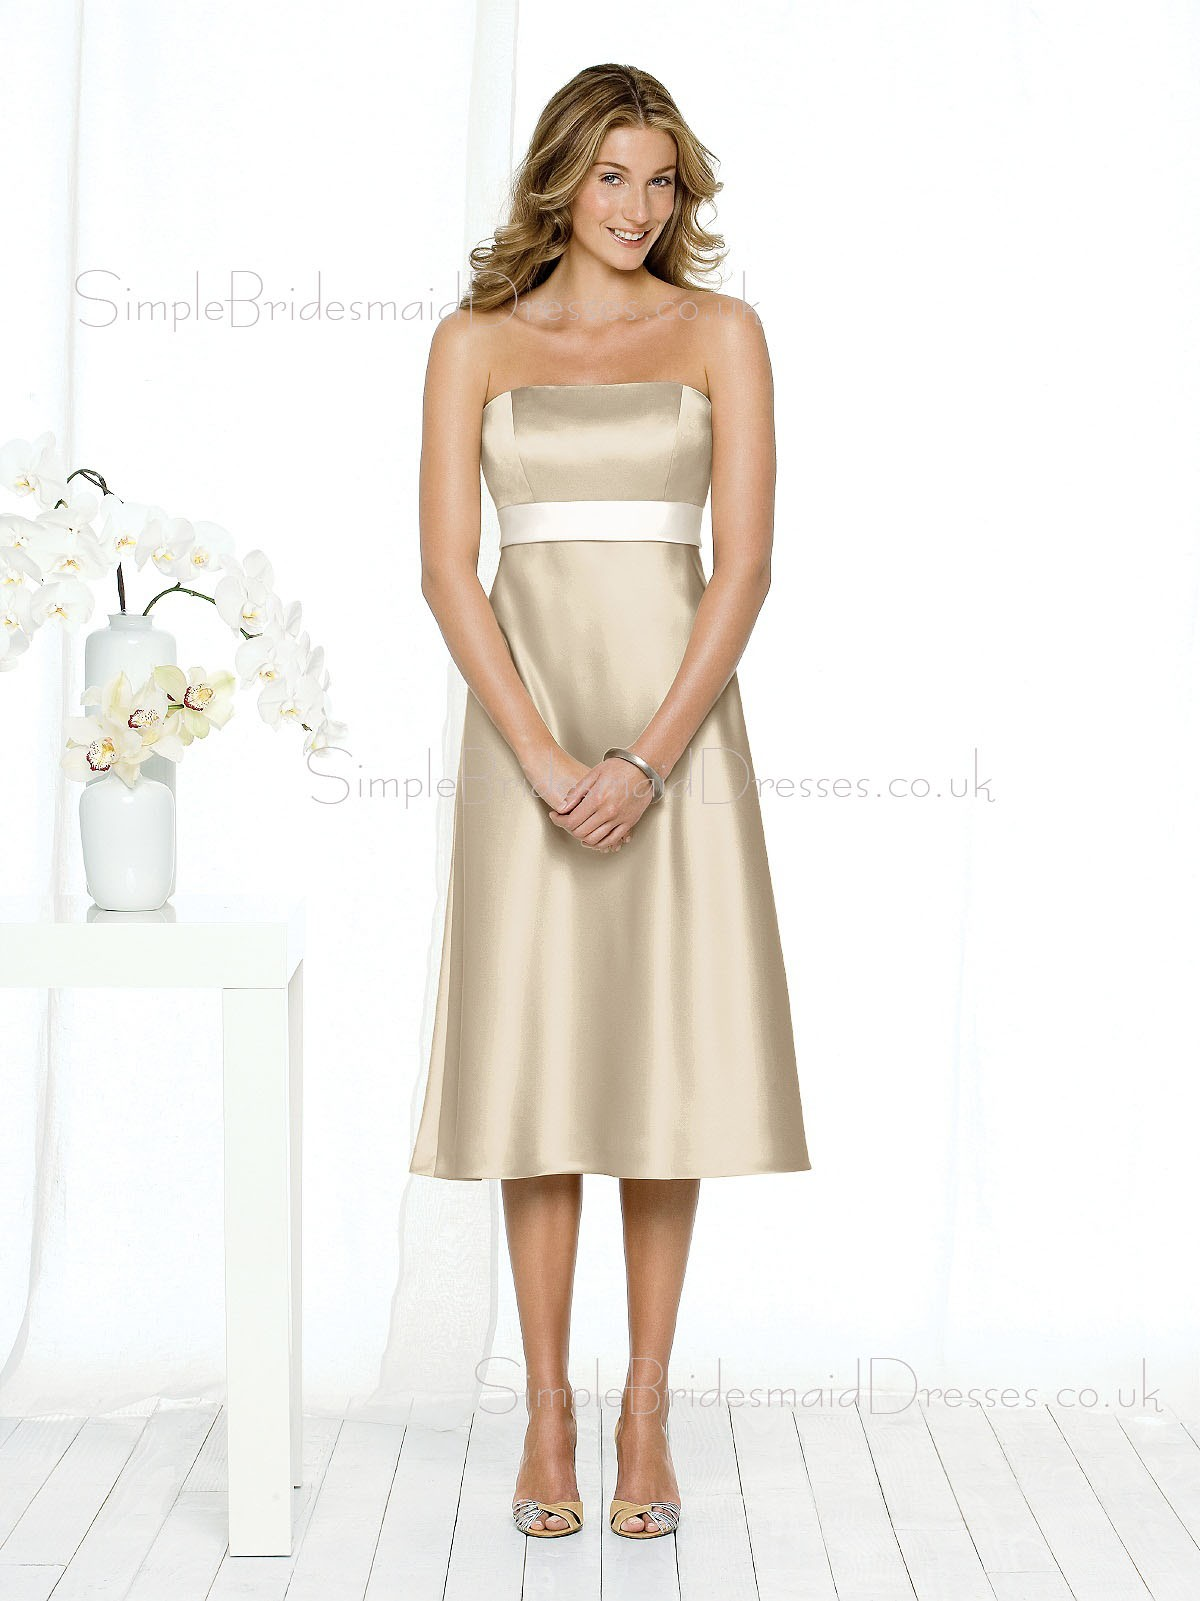 Order free wedding dress catalogs uk order free wedding dress catalogs uk ombrellifo Images